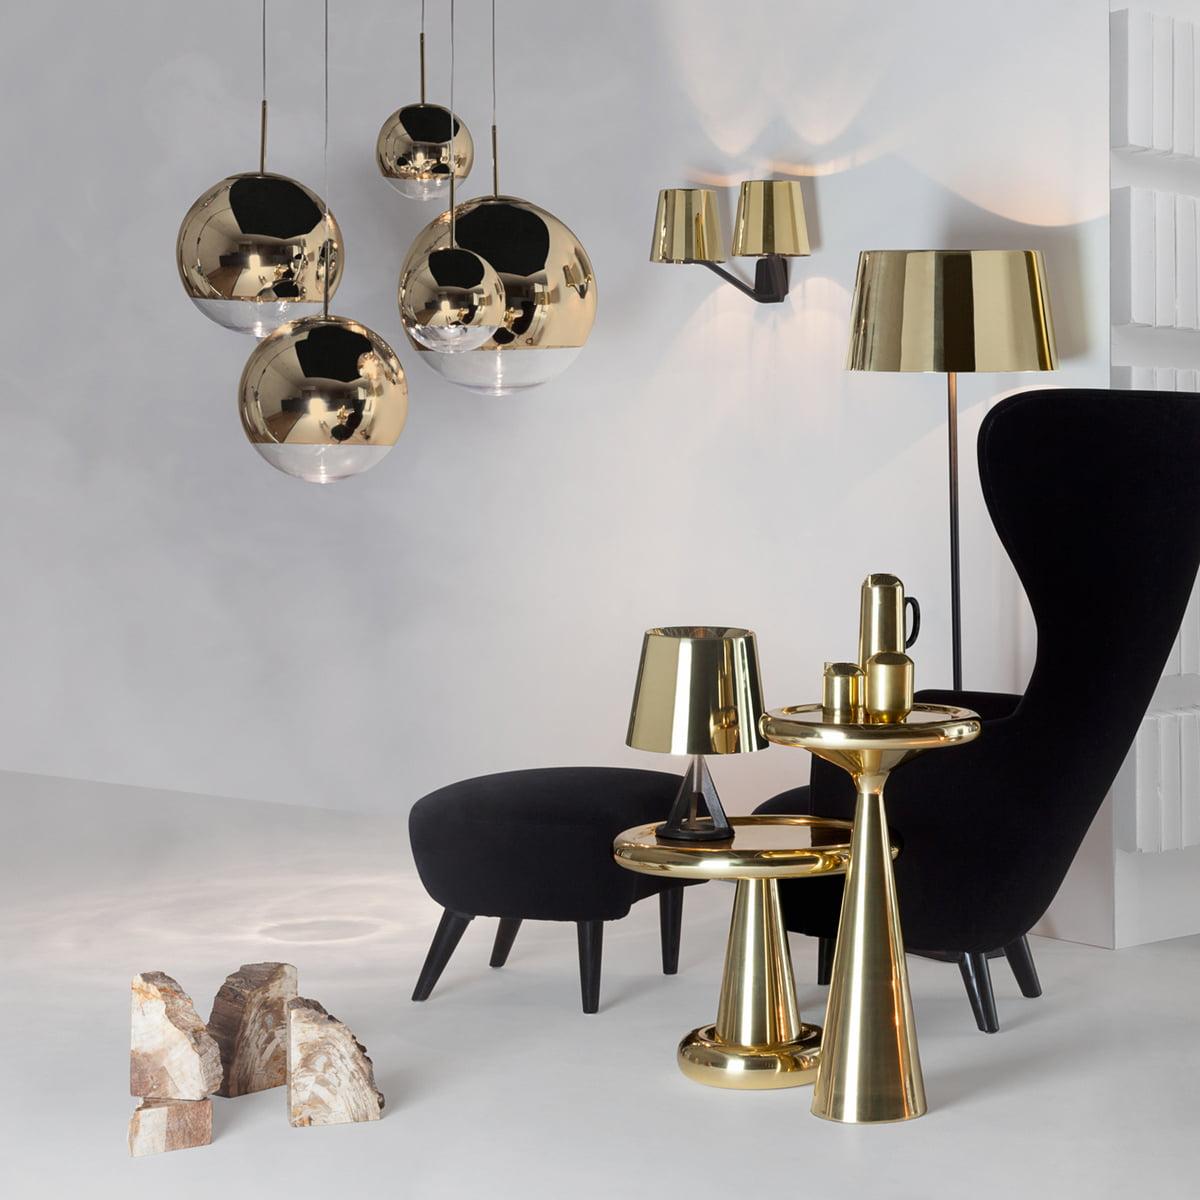 Mirror Ball Gold Pendant Lamp by Tom Dixon